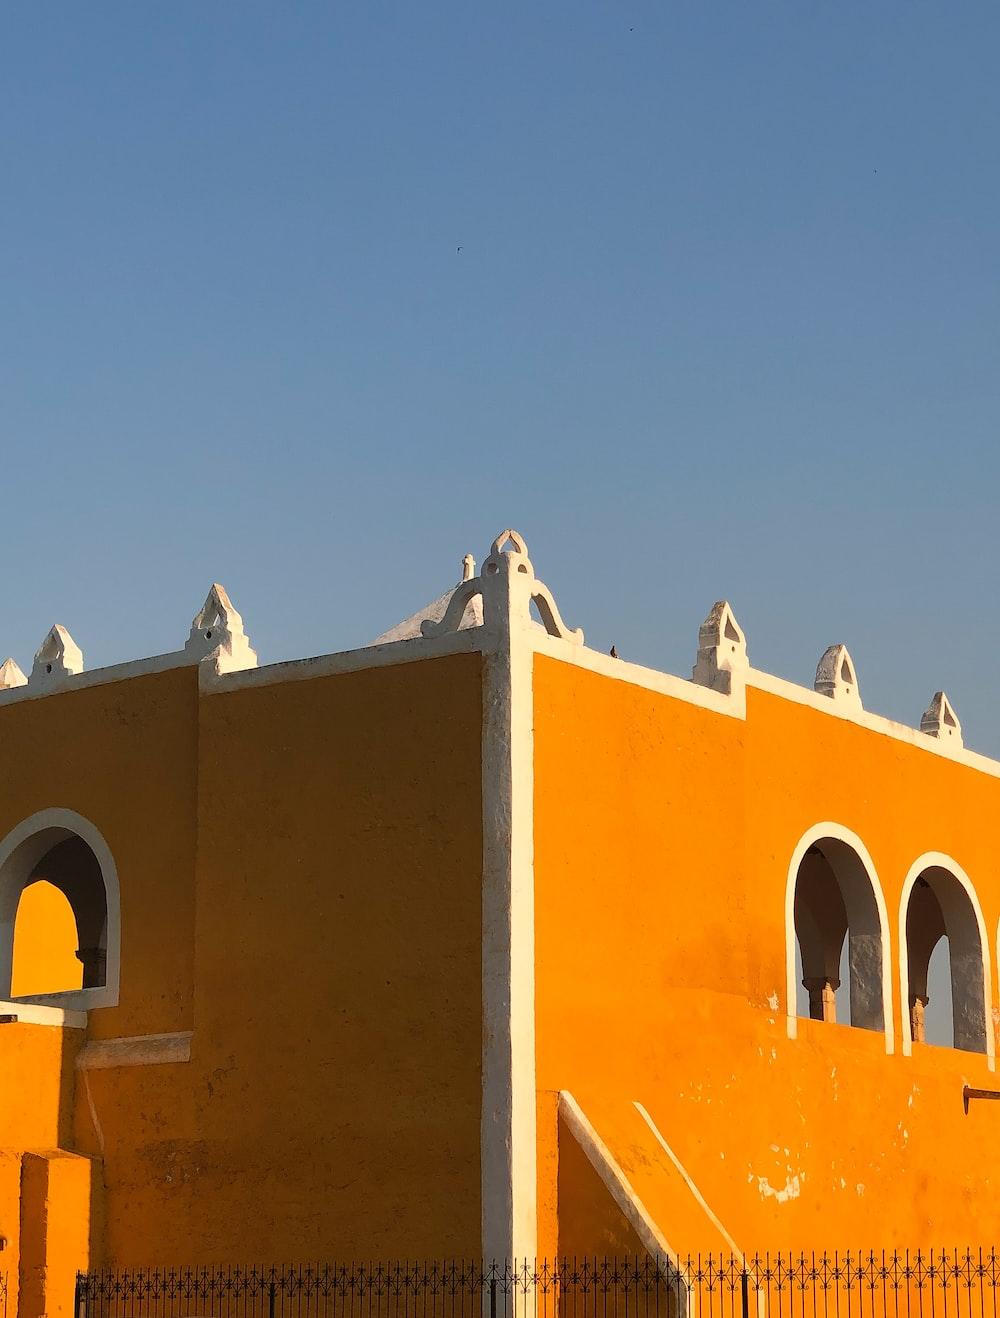 orange and white building